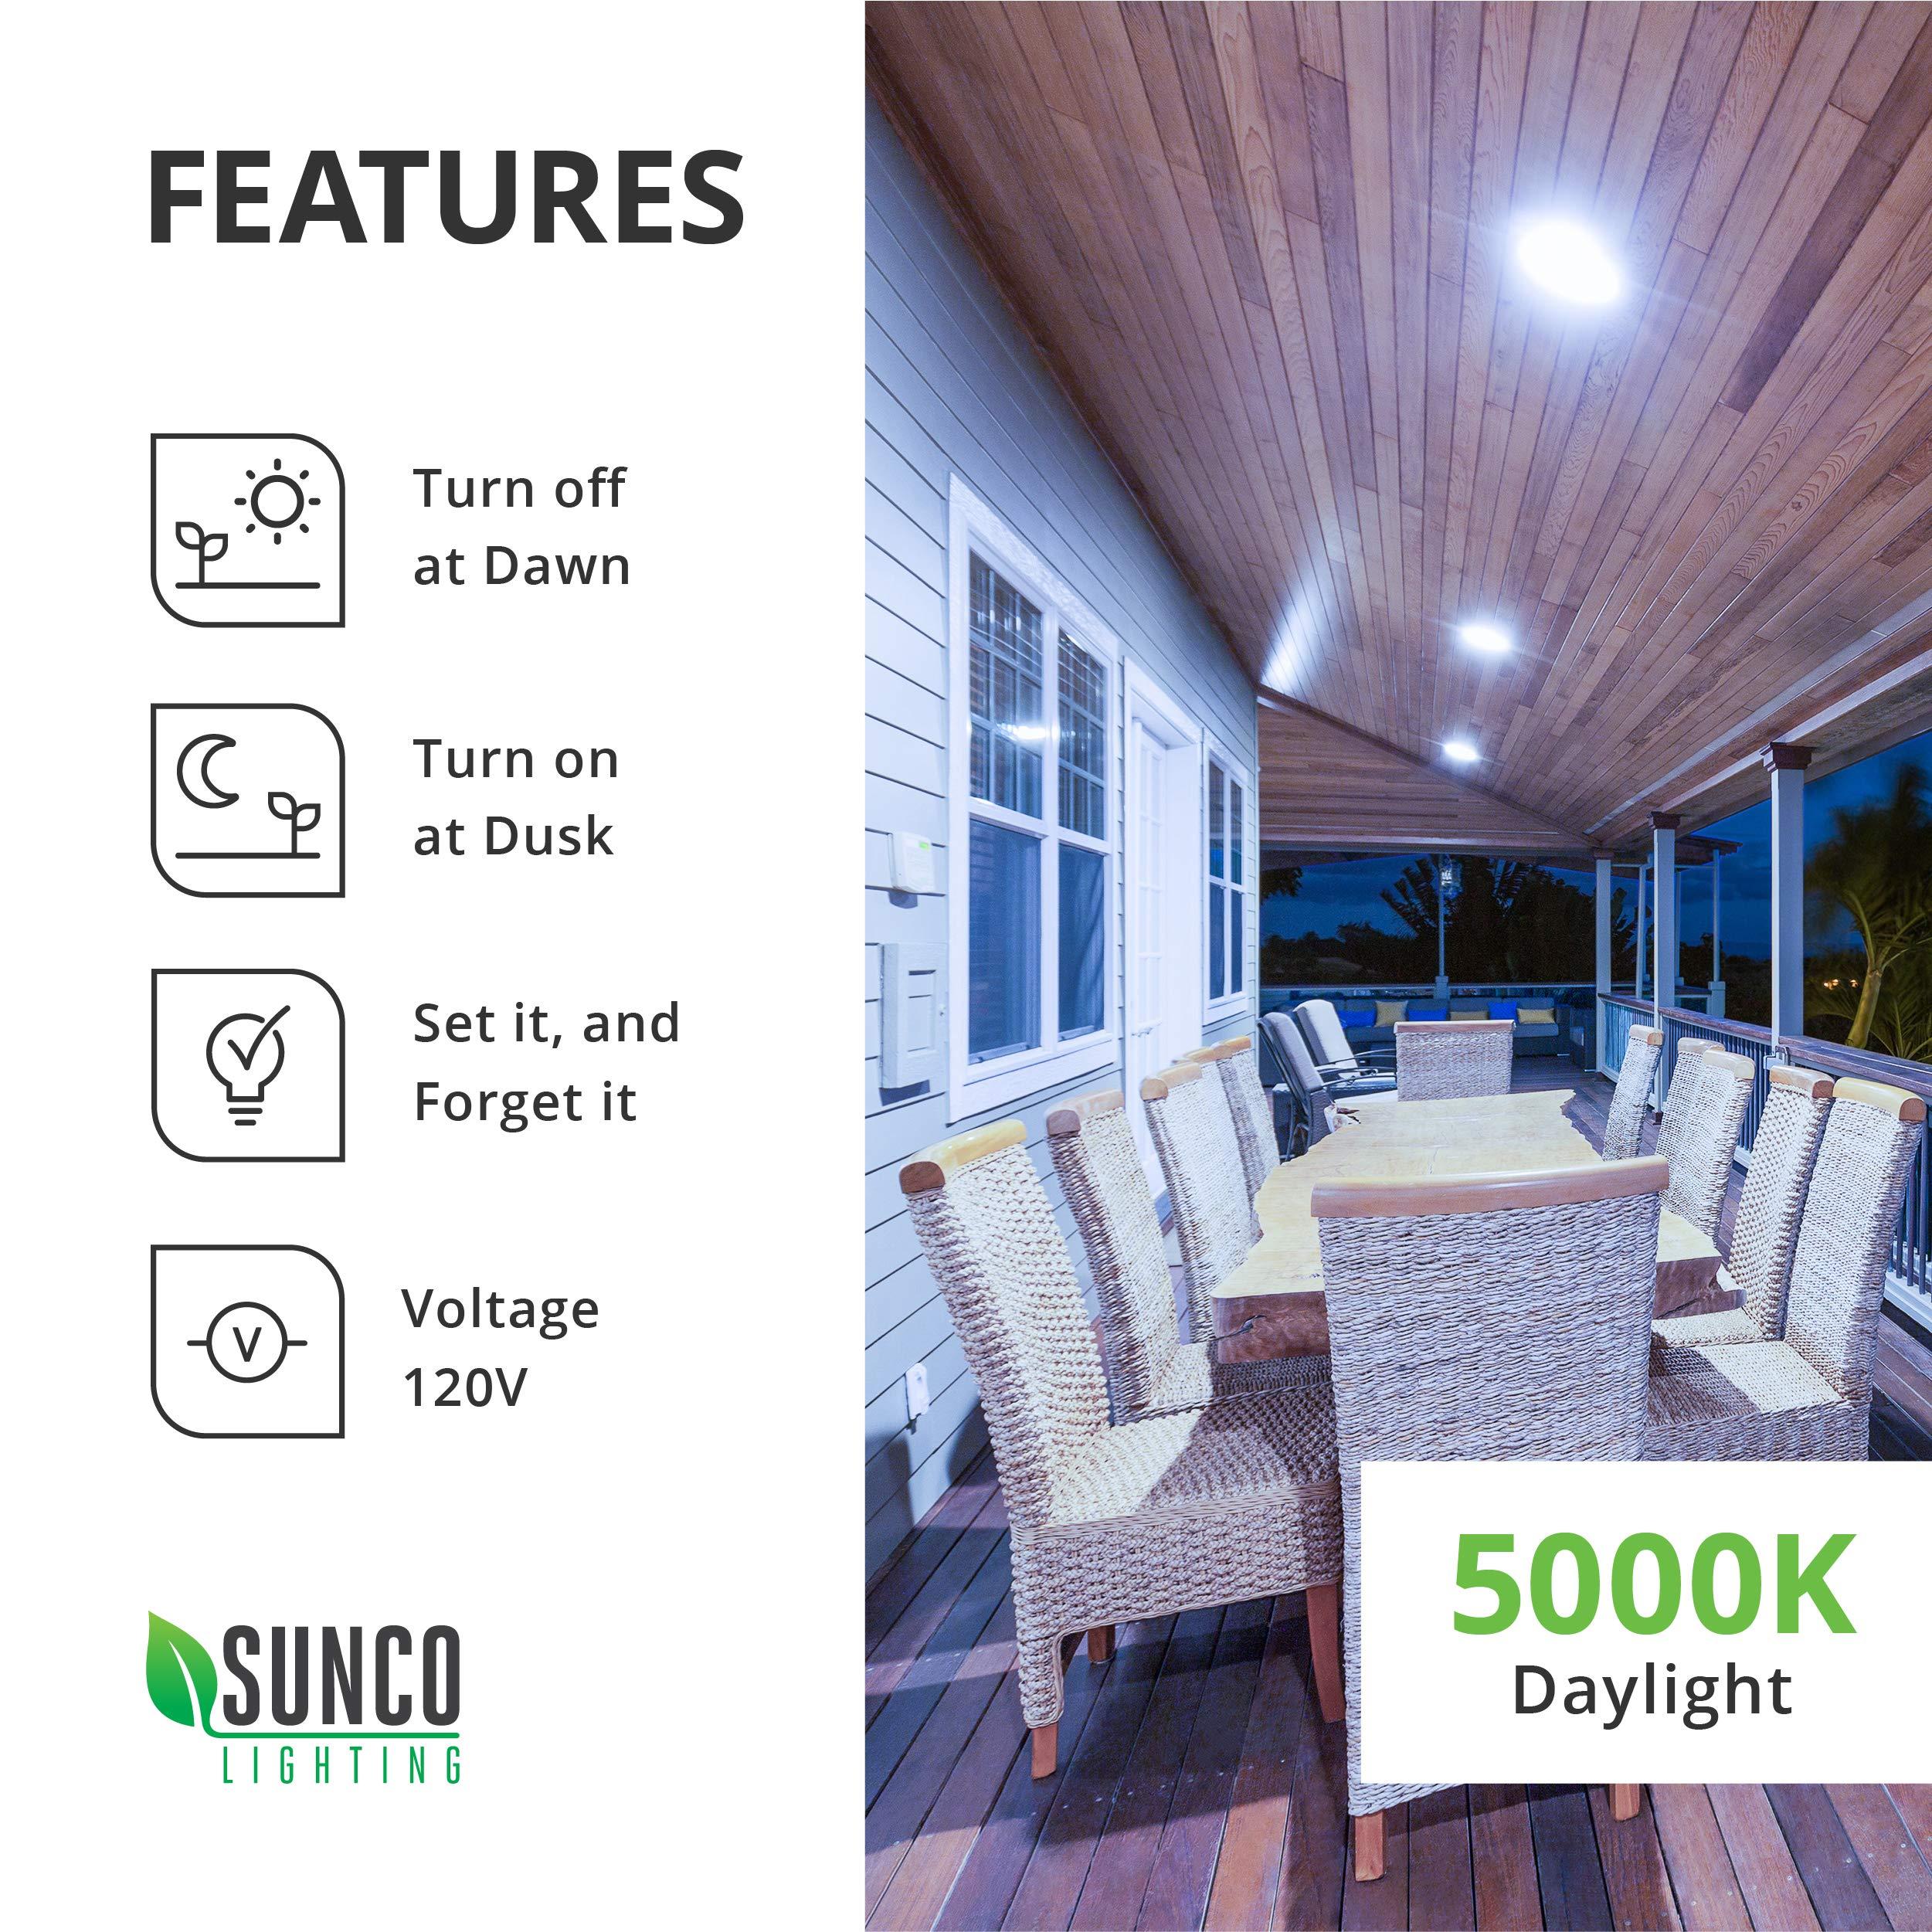 Sunco Lighting 4 Pack PAR30 LED Bulb, Dusk-to-Dawn Photocell Sensor, 11W=75W, 5000K Daylight, 850 LM, Auto On/Off Security Flood Light - UL by Sunco Lighting (Image #5)